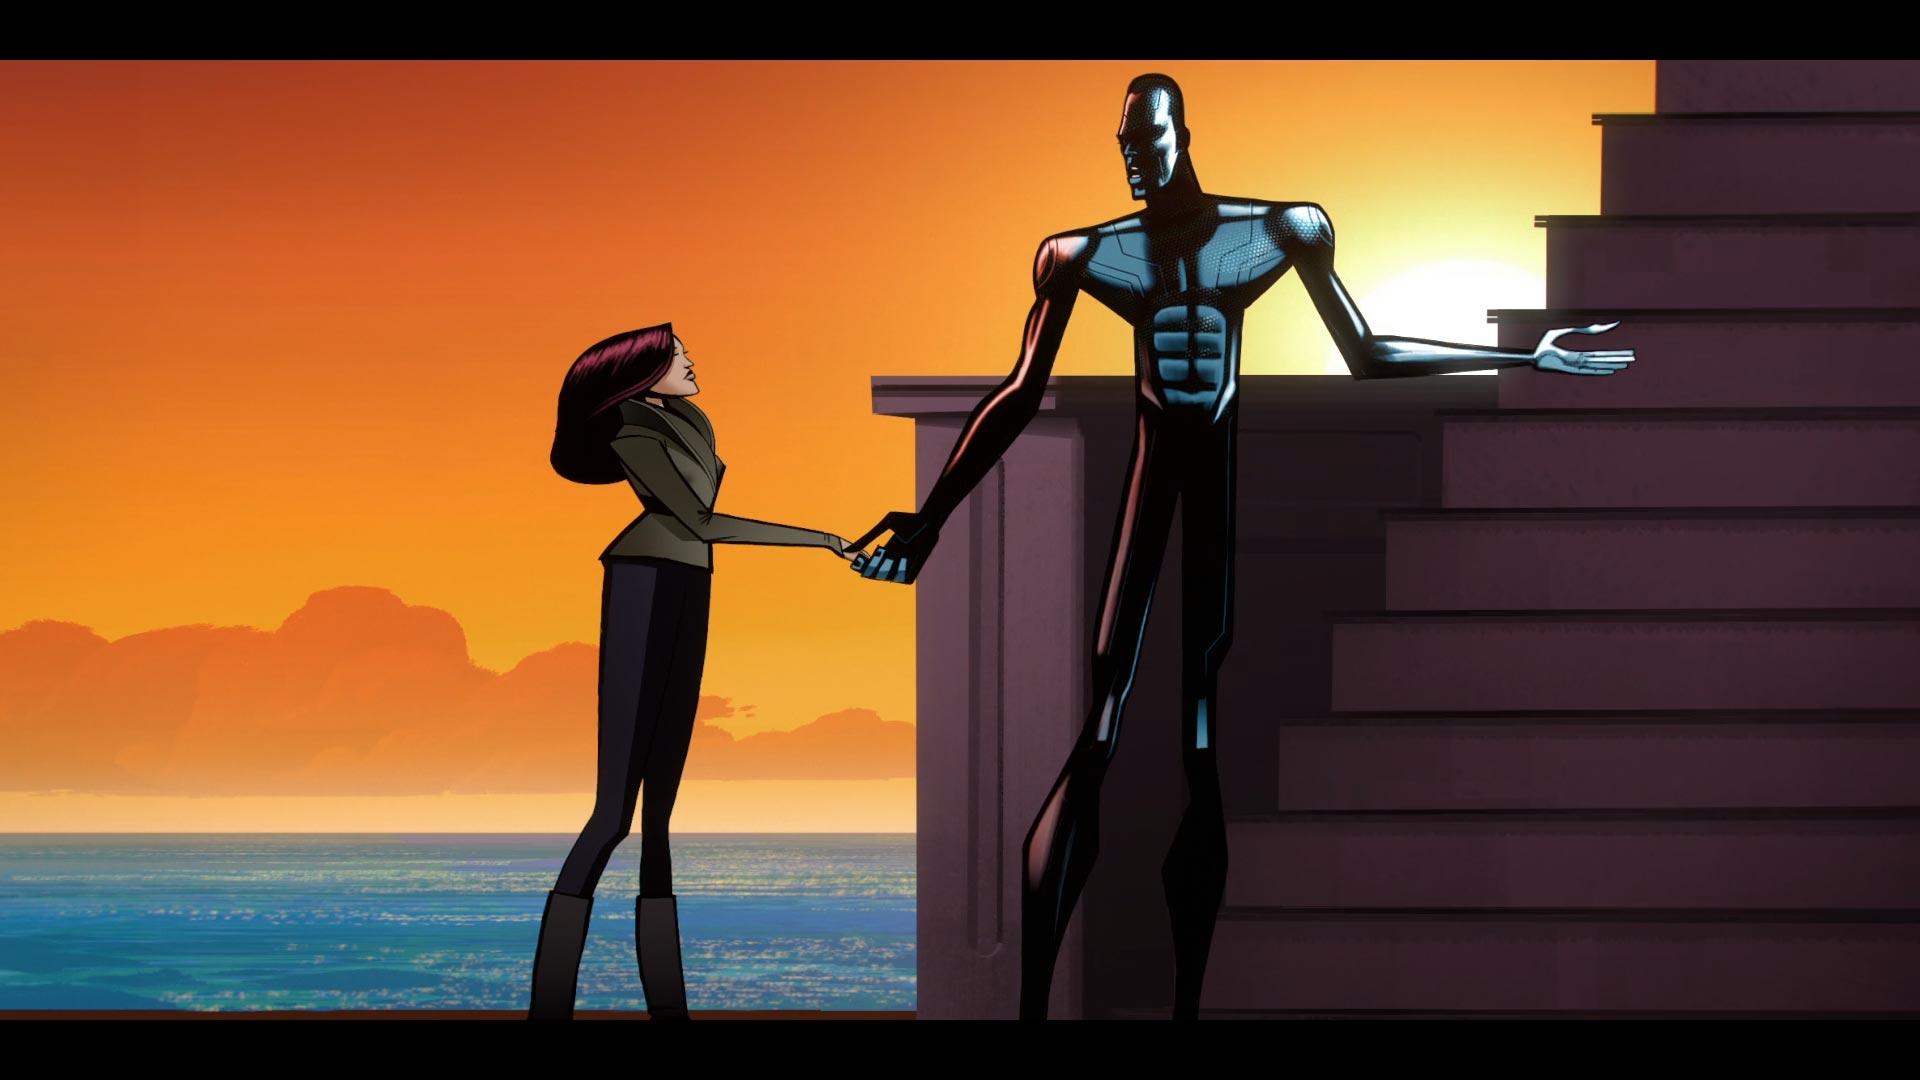 Zima-Blue-Love,Death-&-Robots_meeting Contemporary Bohemians